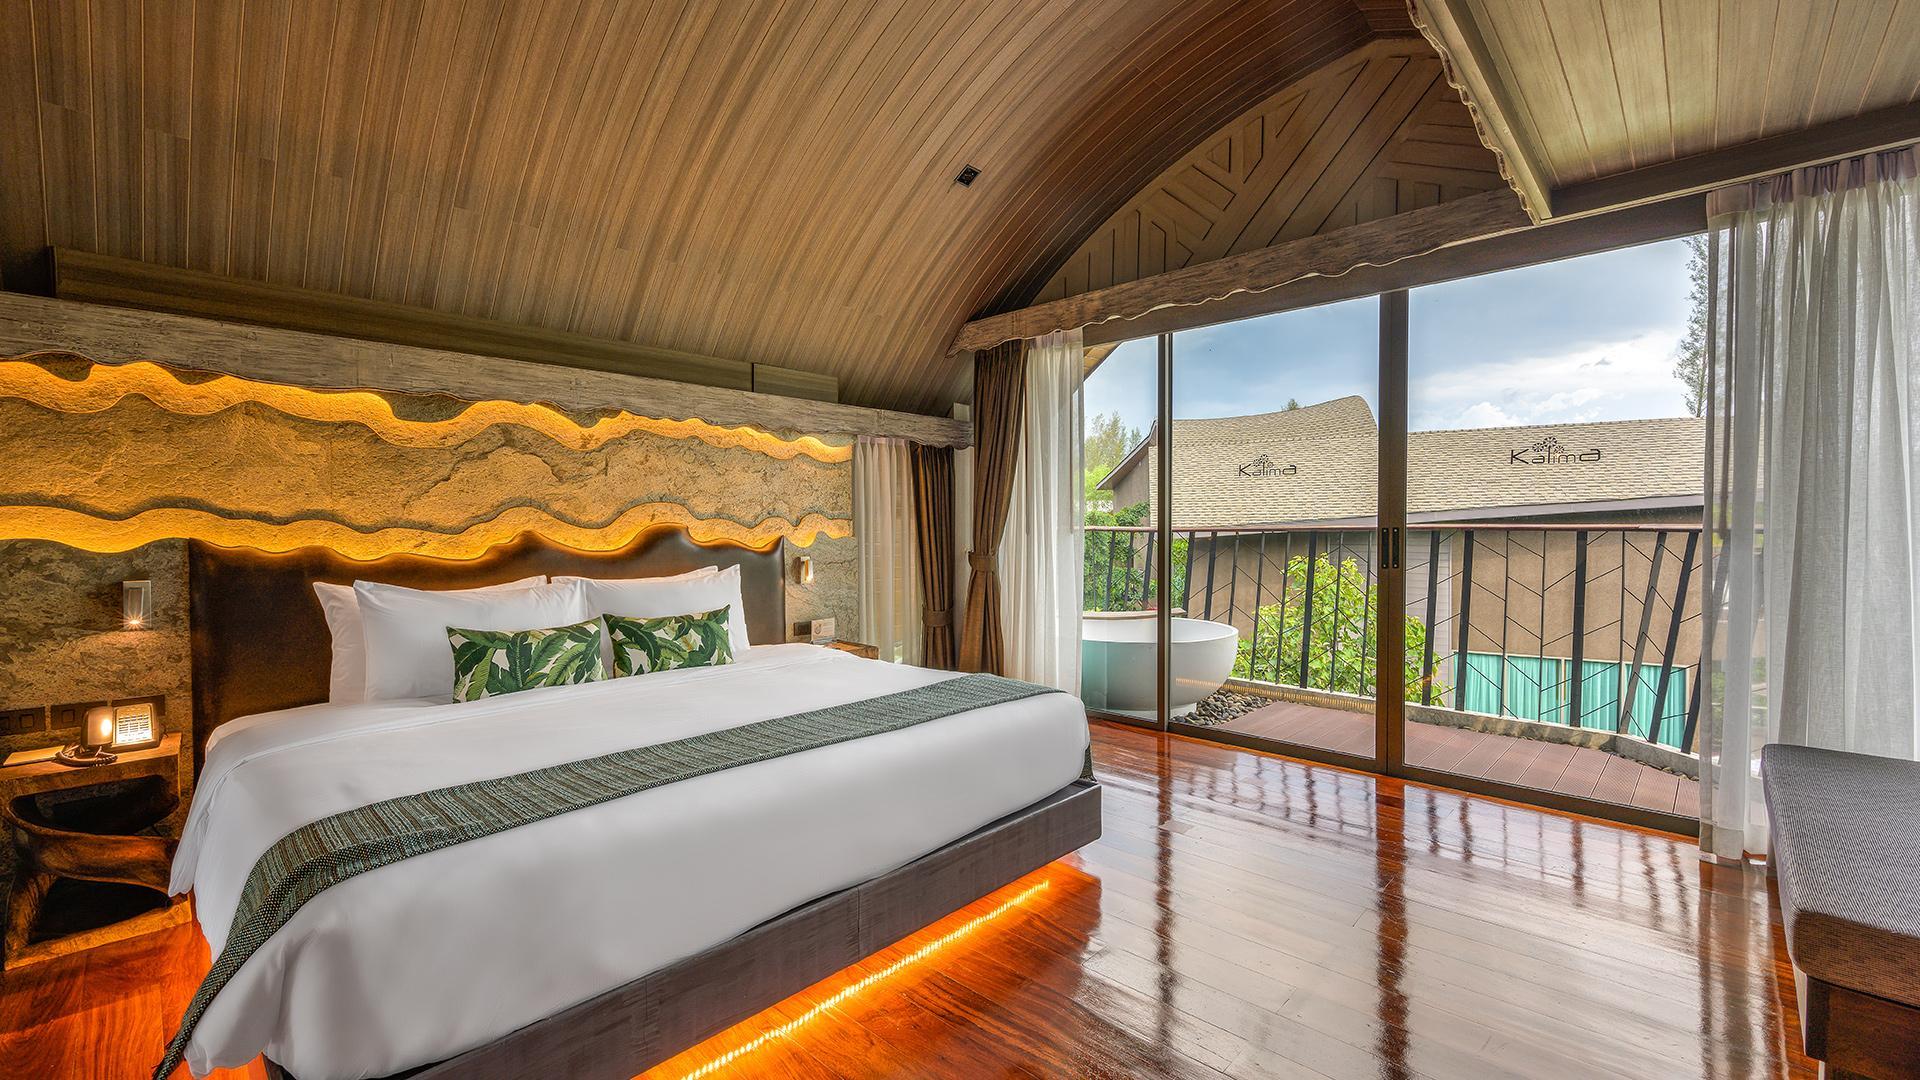 One-Bedroom Pool Villa Duplex image 1 at Kalima Resort and Villas Khao Lak by Amphoe Thai Mueang, Phang-nga, Thailand